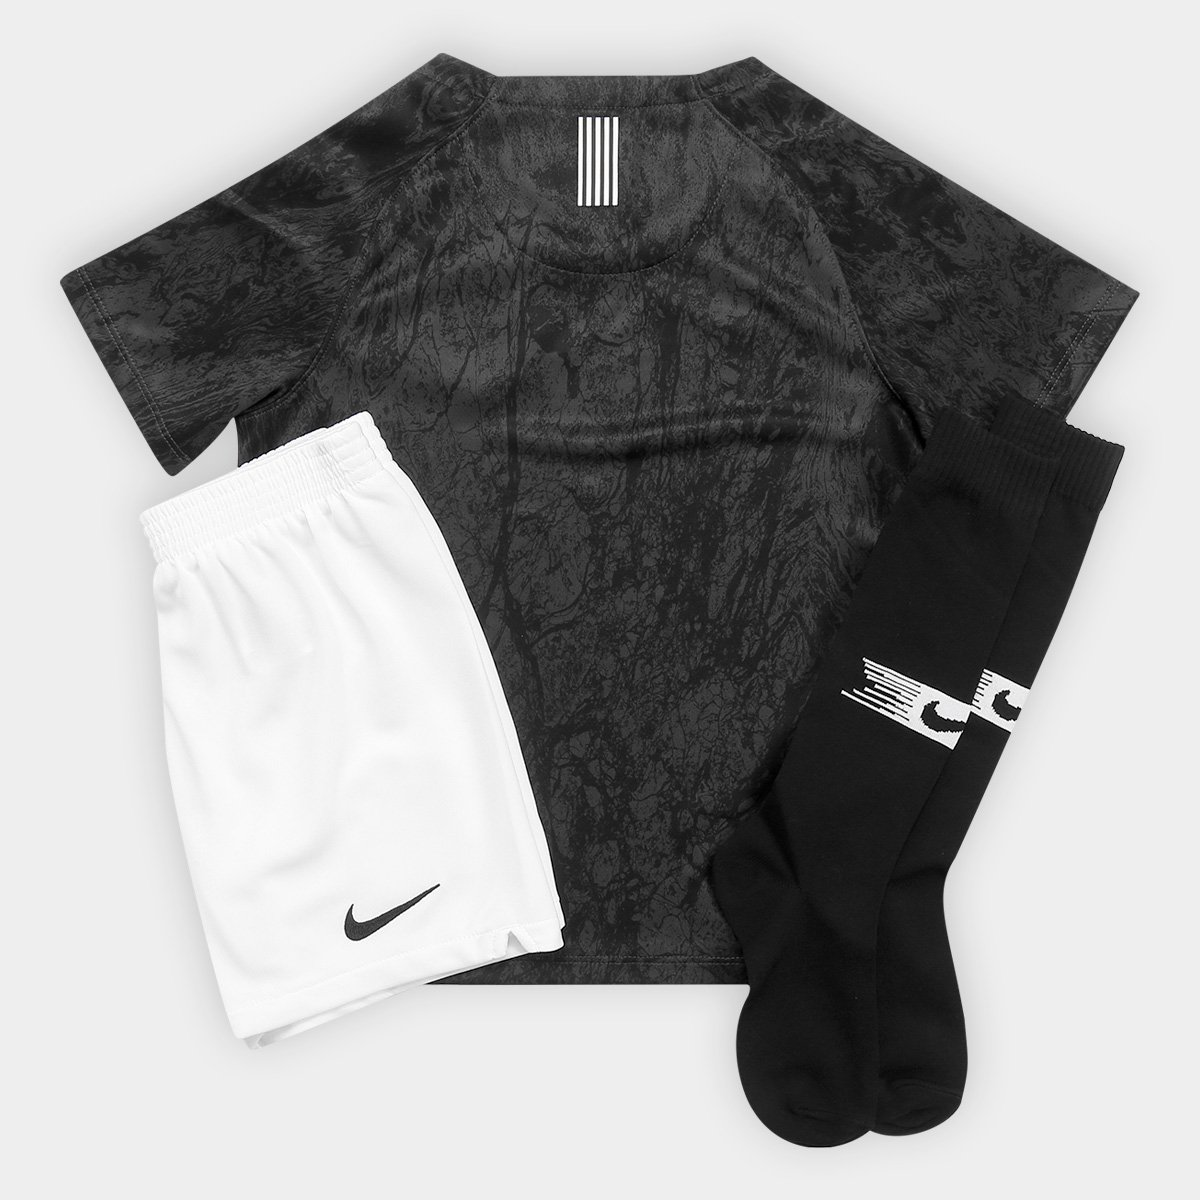 376ffa053b Kit Corinthians Infantil II 2018 s n° Torcedor Nike - Compre Agora ...